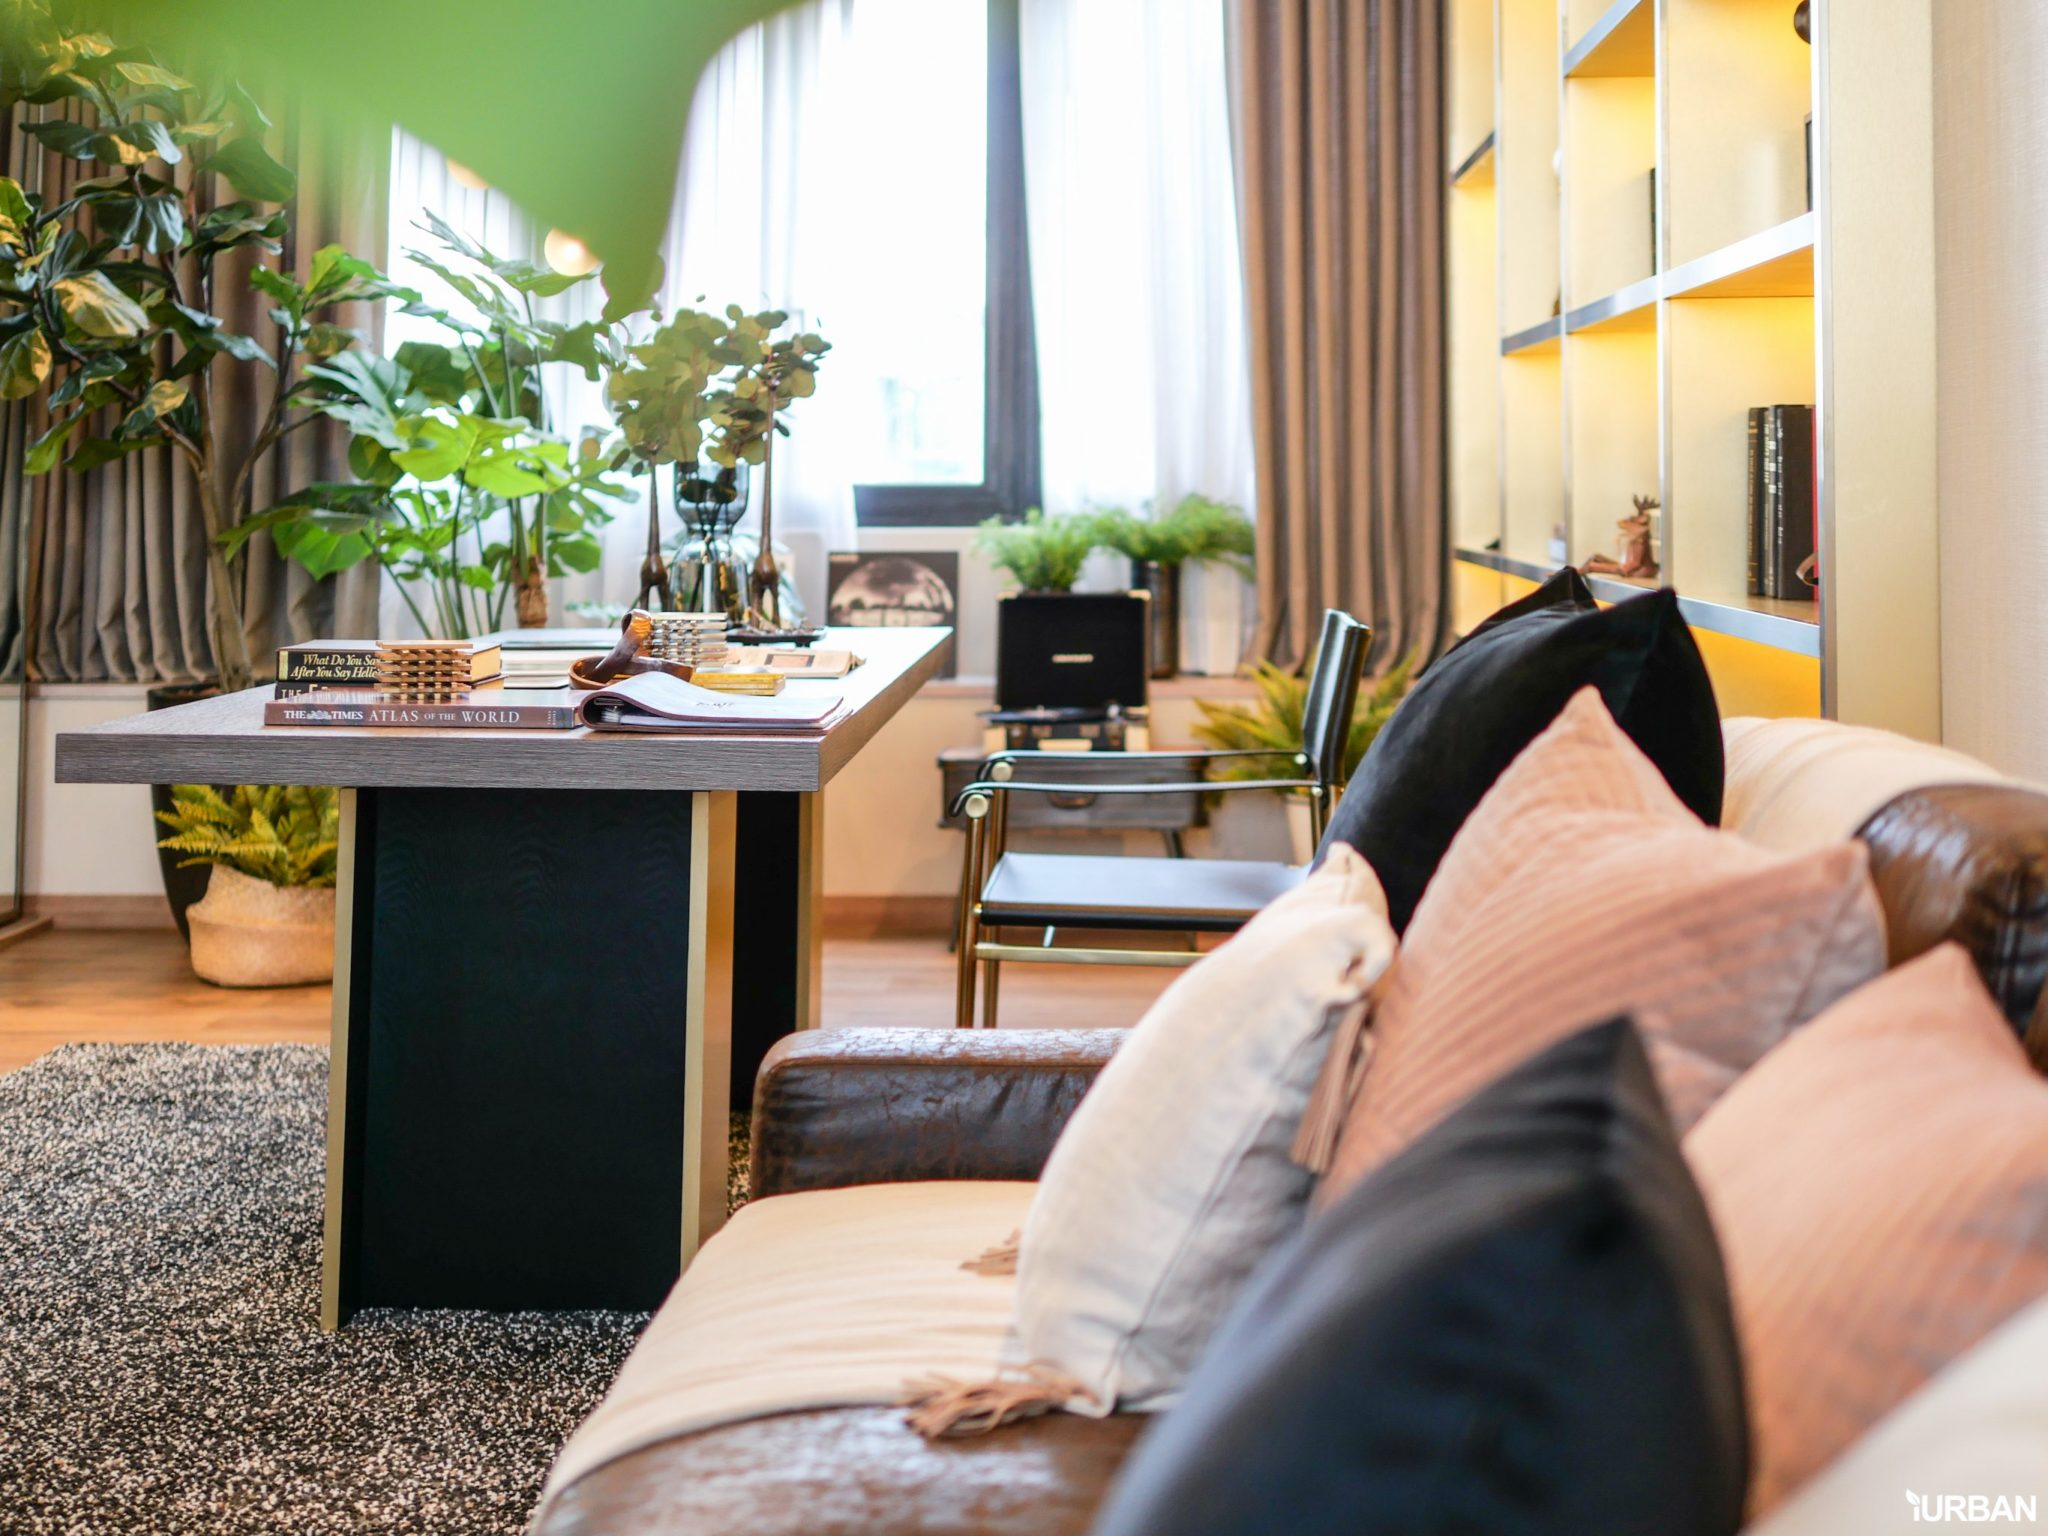 AIRES RAMA9 รีวิว Luxury Townhome 3.5 ชั้น + Rooftop ออกแบบสวย ย่านพระราม9 (ใกล้ รพ.สมิติเวช) 71 - AIRES